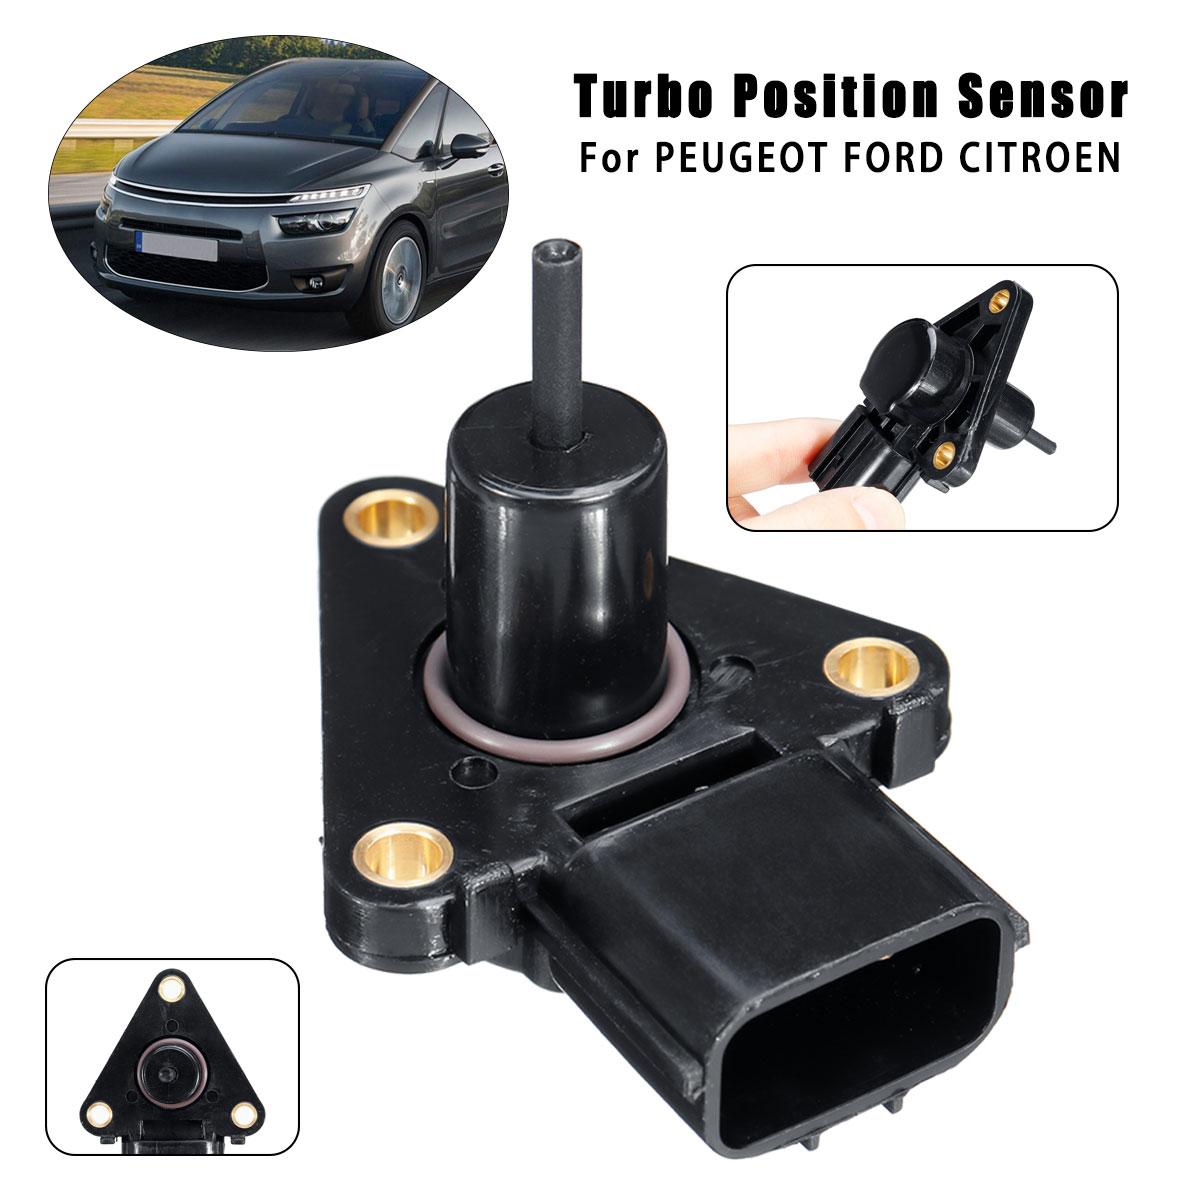 Turbo Şarj Aktüatör Pozisyon Sensörü Için Peugeot/Ford/Citroen 0375K1 0375K8